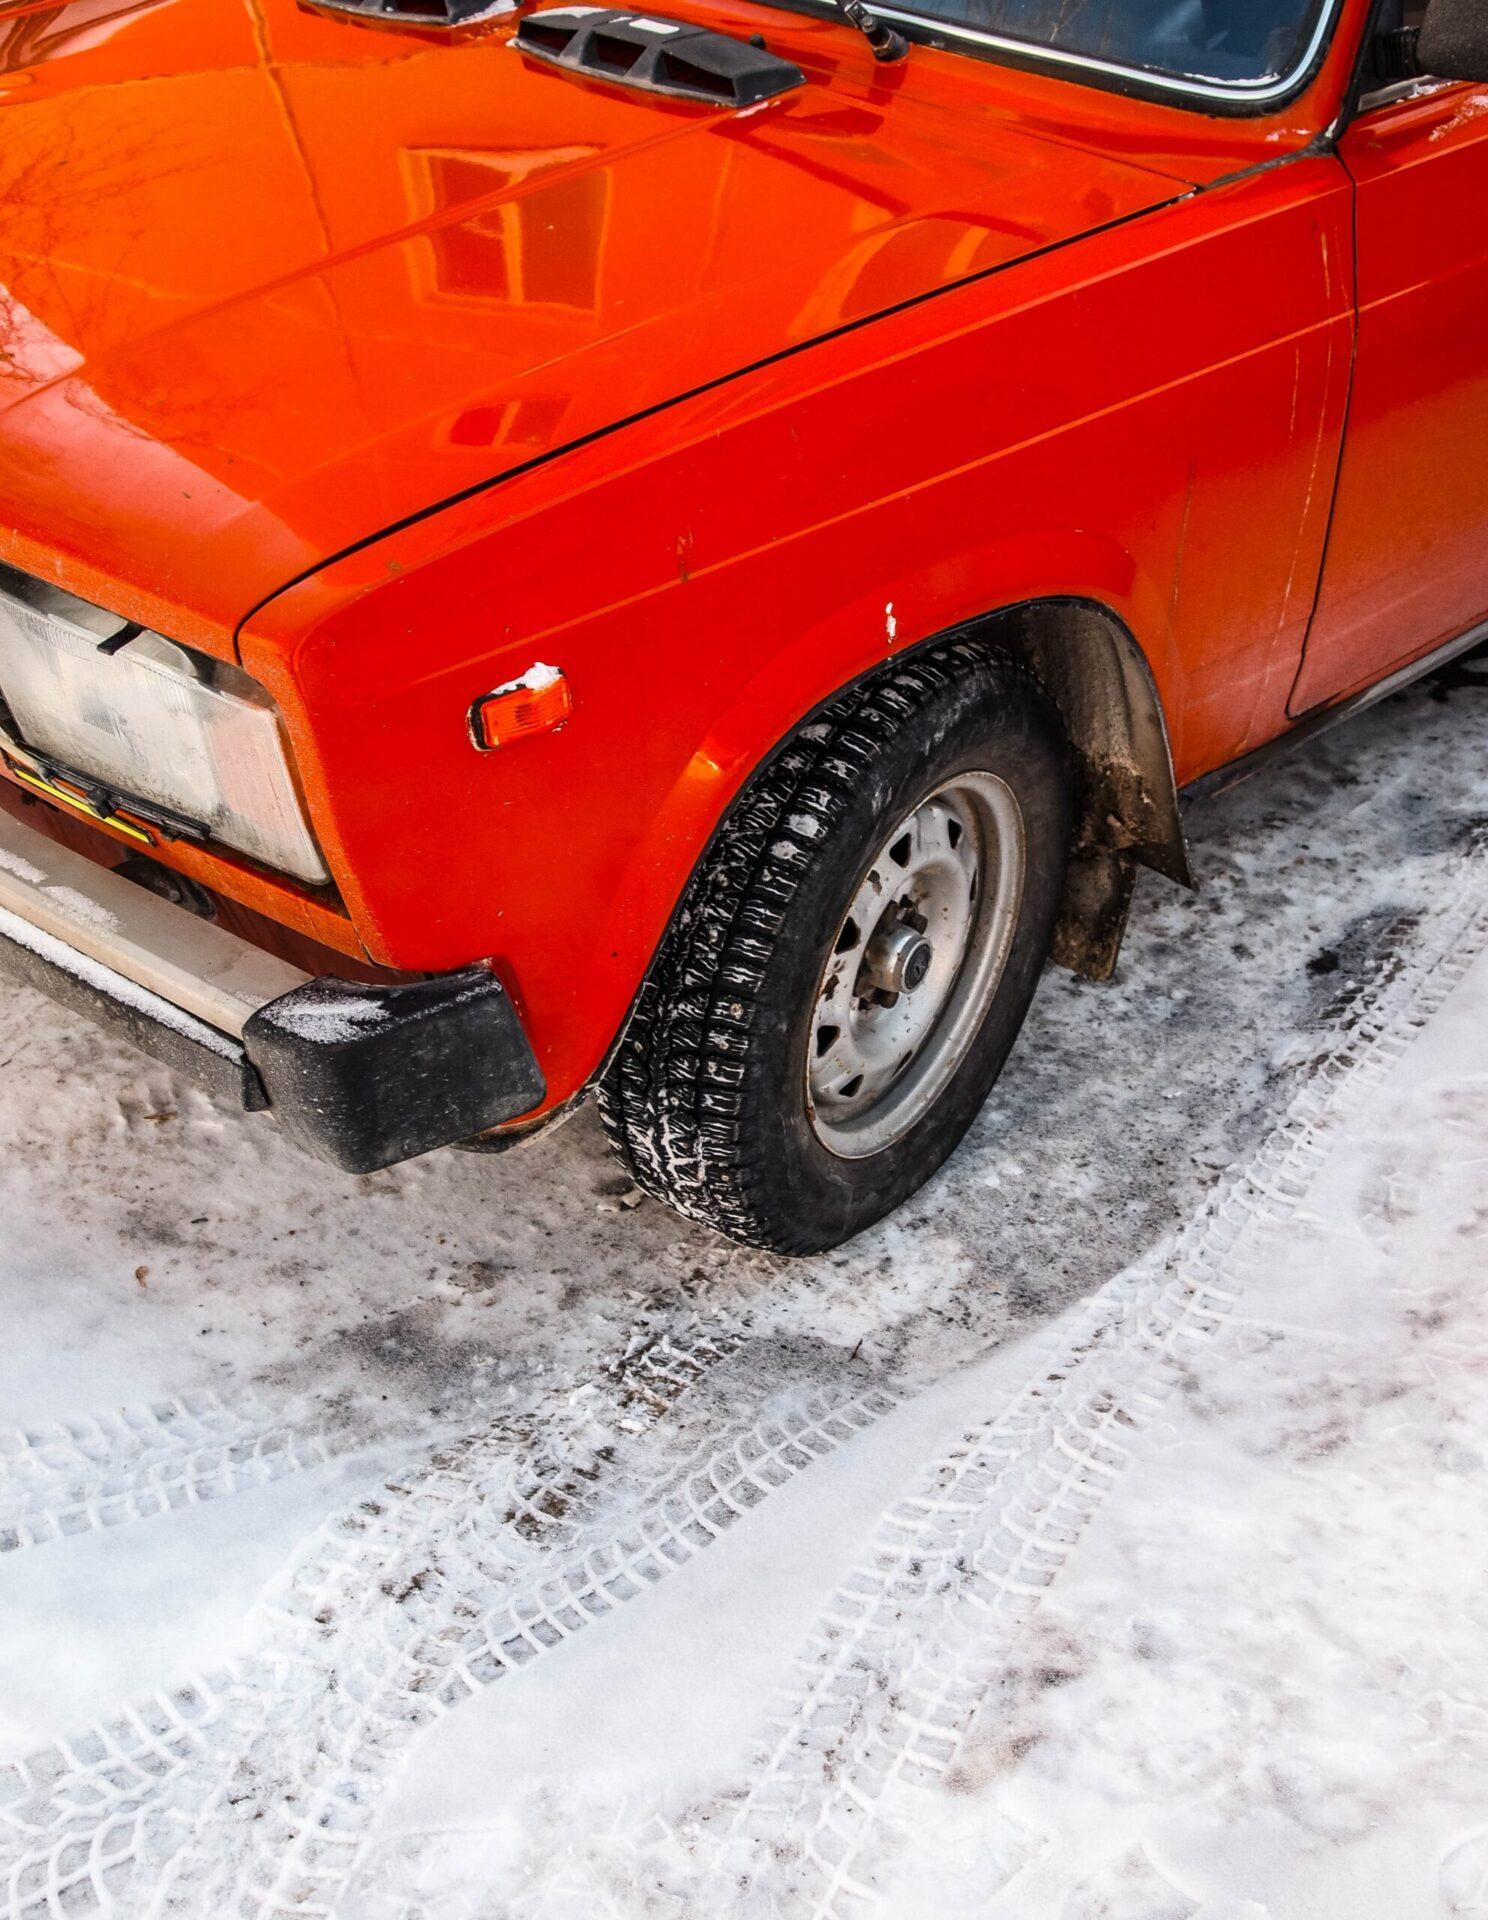 winter car driving through the snow